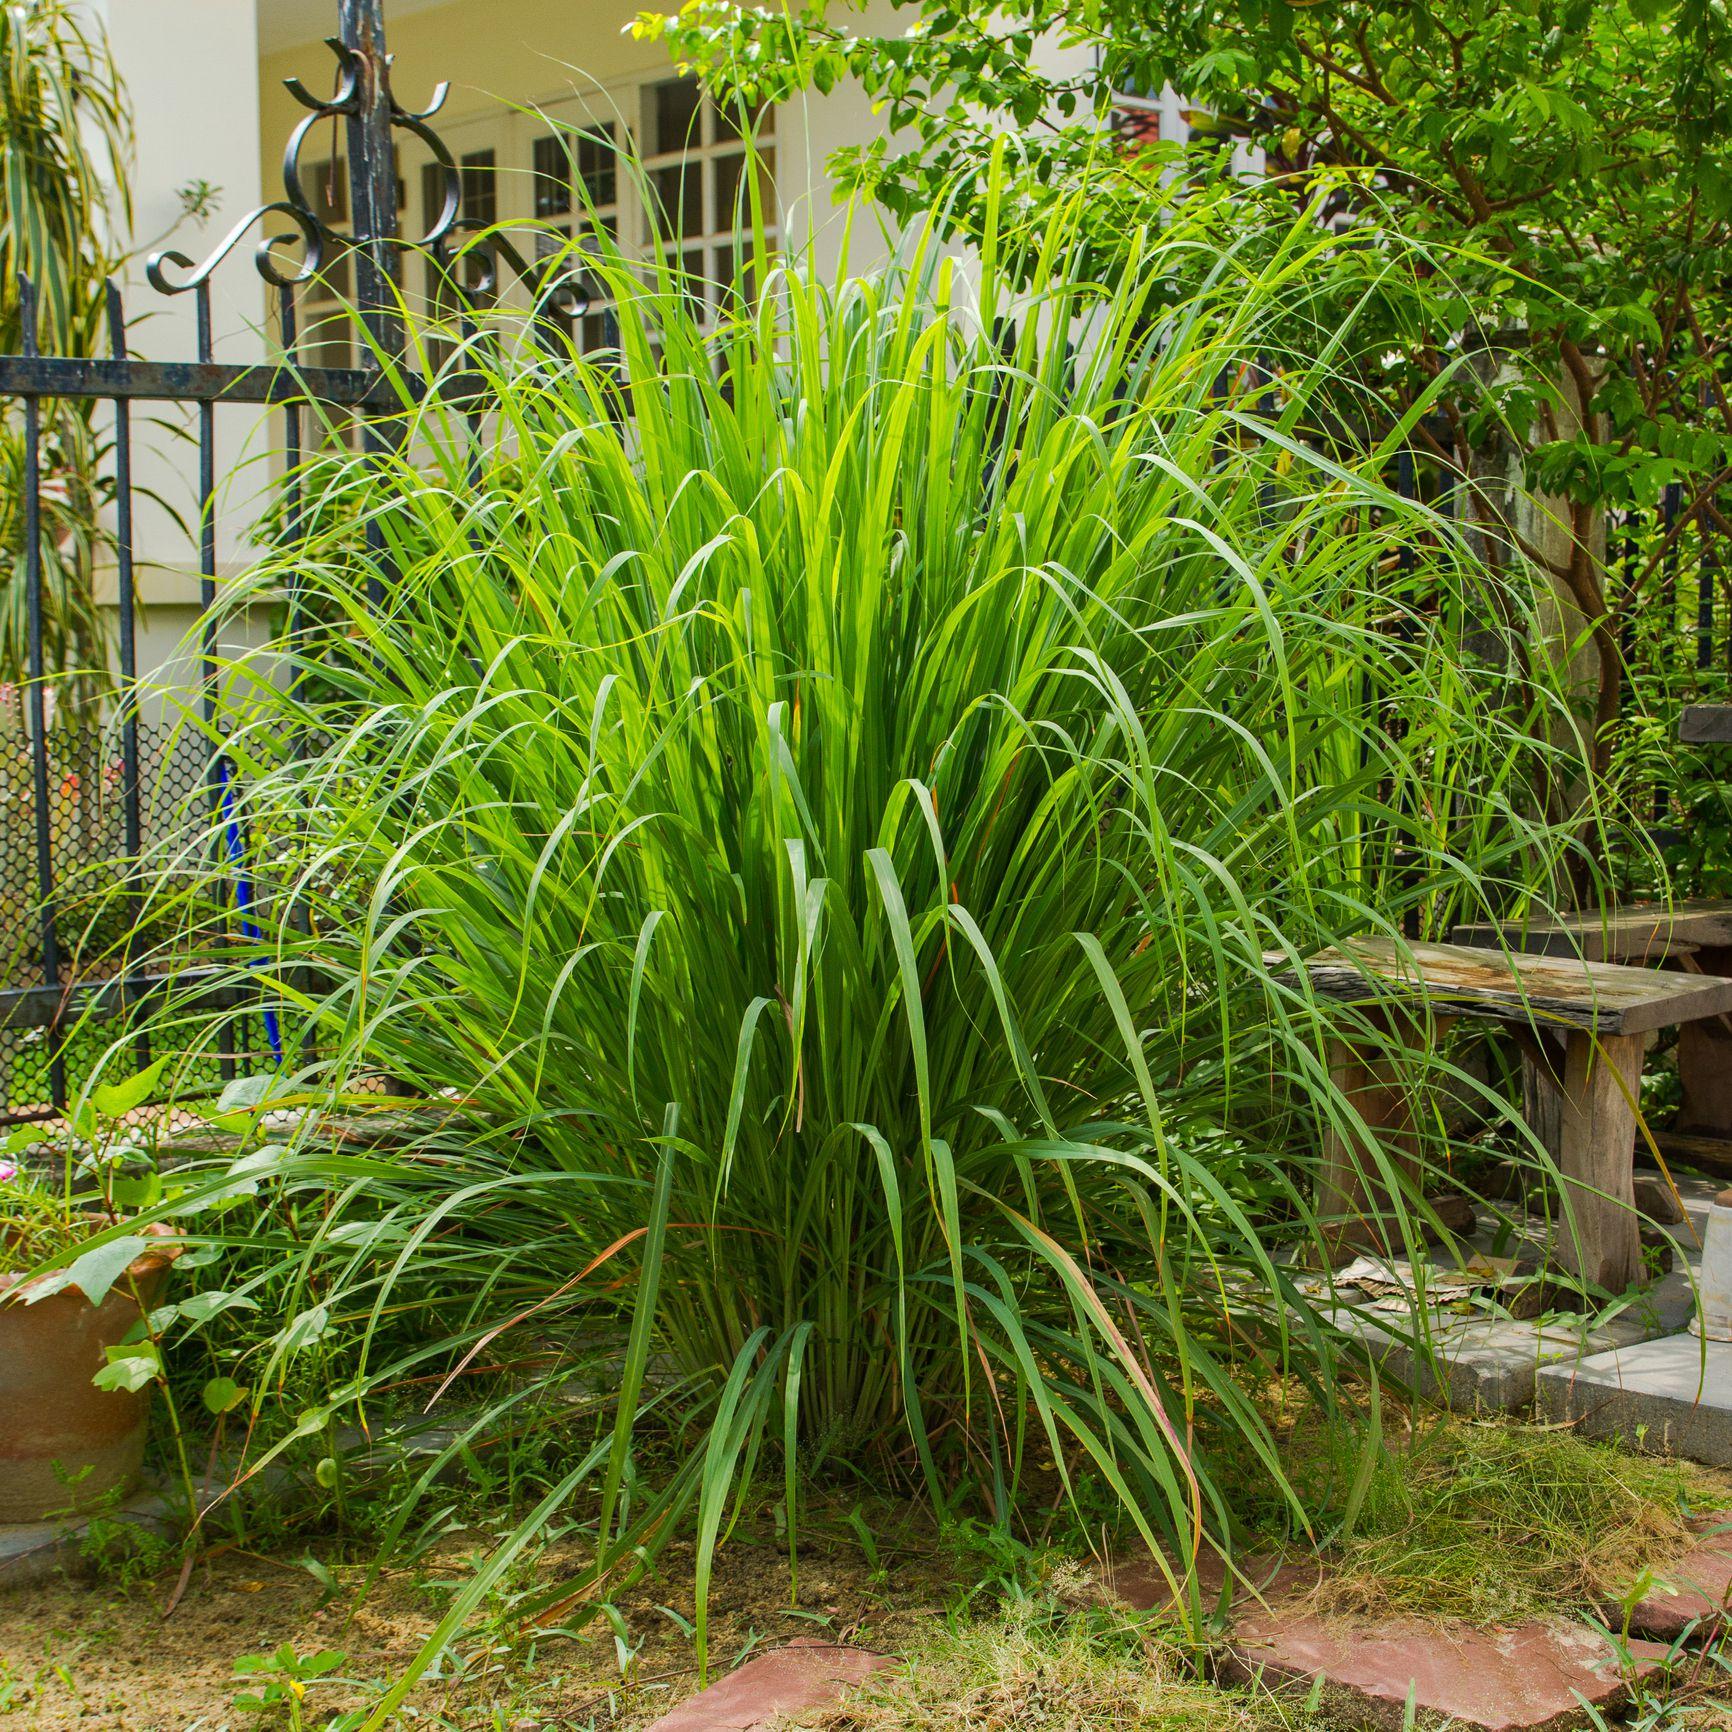 Lemongrass Growing in Garden